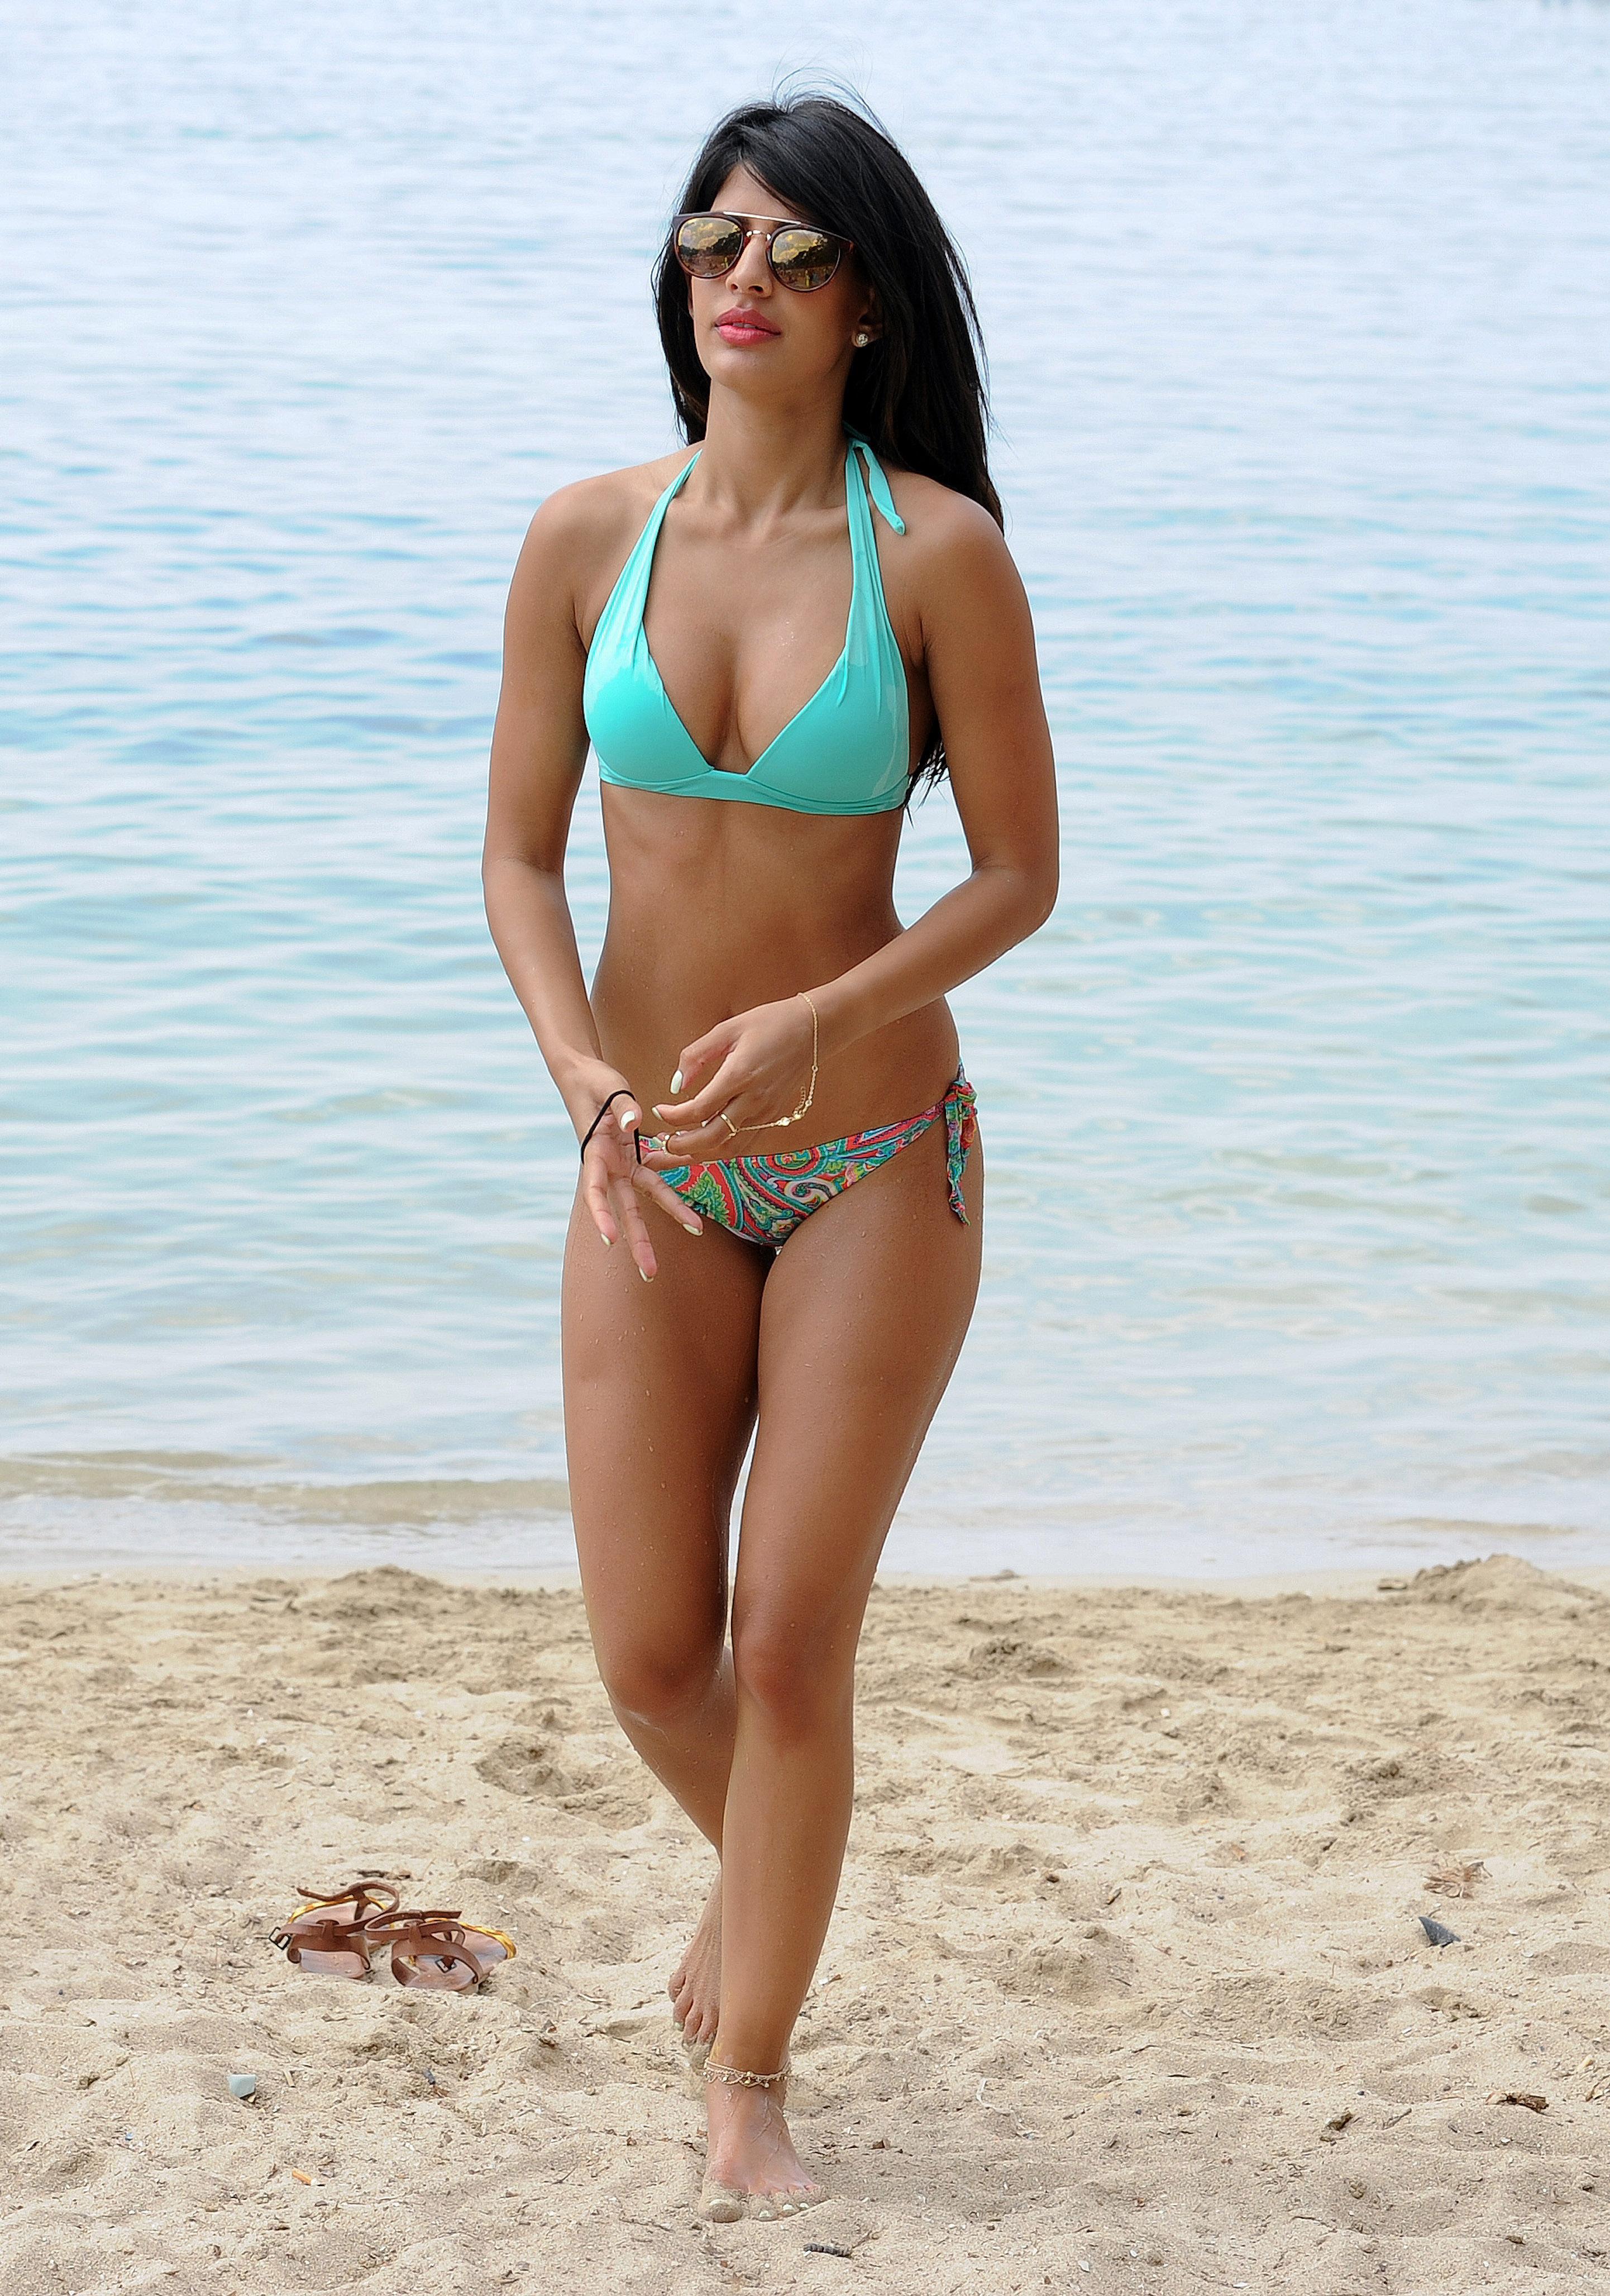 jasmin-walia-wearing-a-bikini-on-the-beach-16